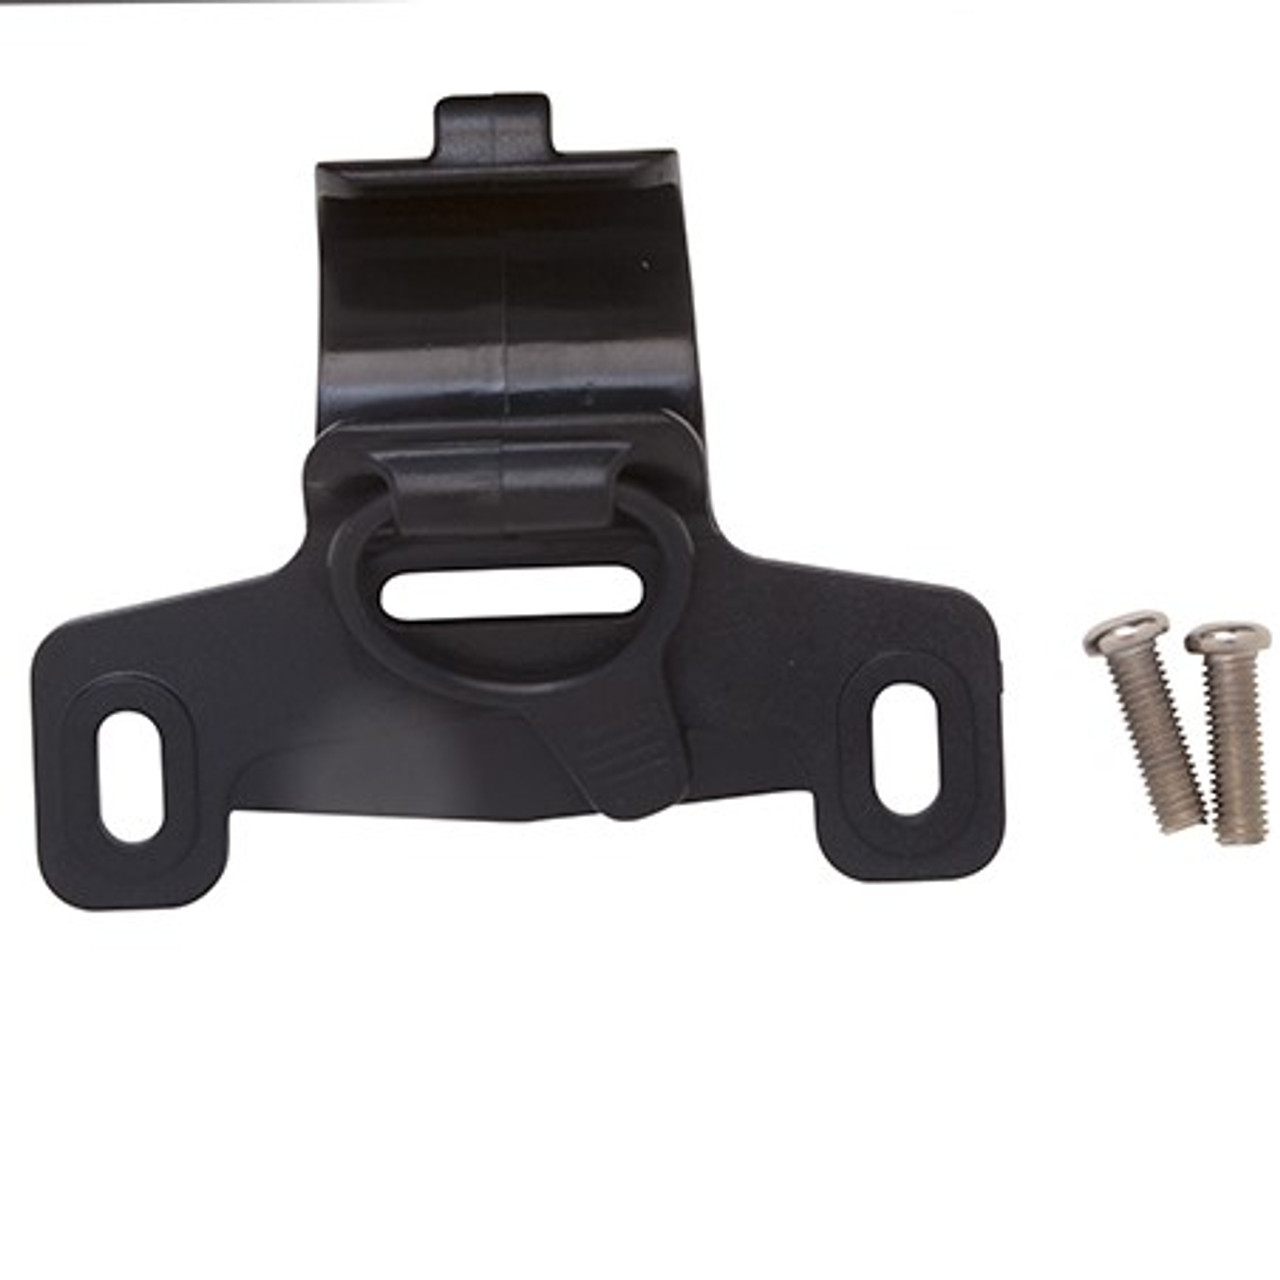 1PC Black Mini Bike Bicycle Pump Holder Portable Pump Retaining Clips Bracket W0